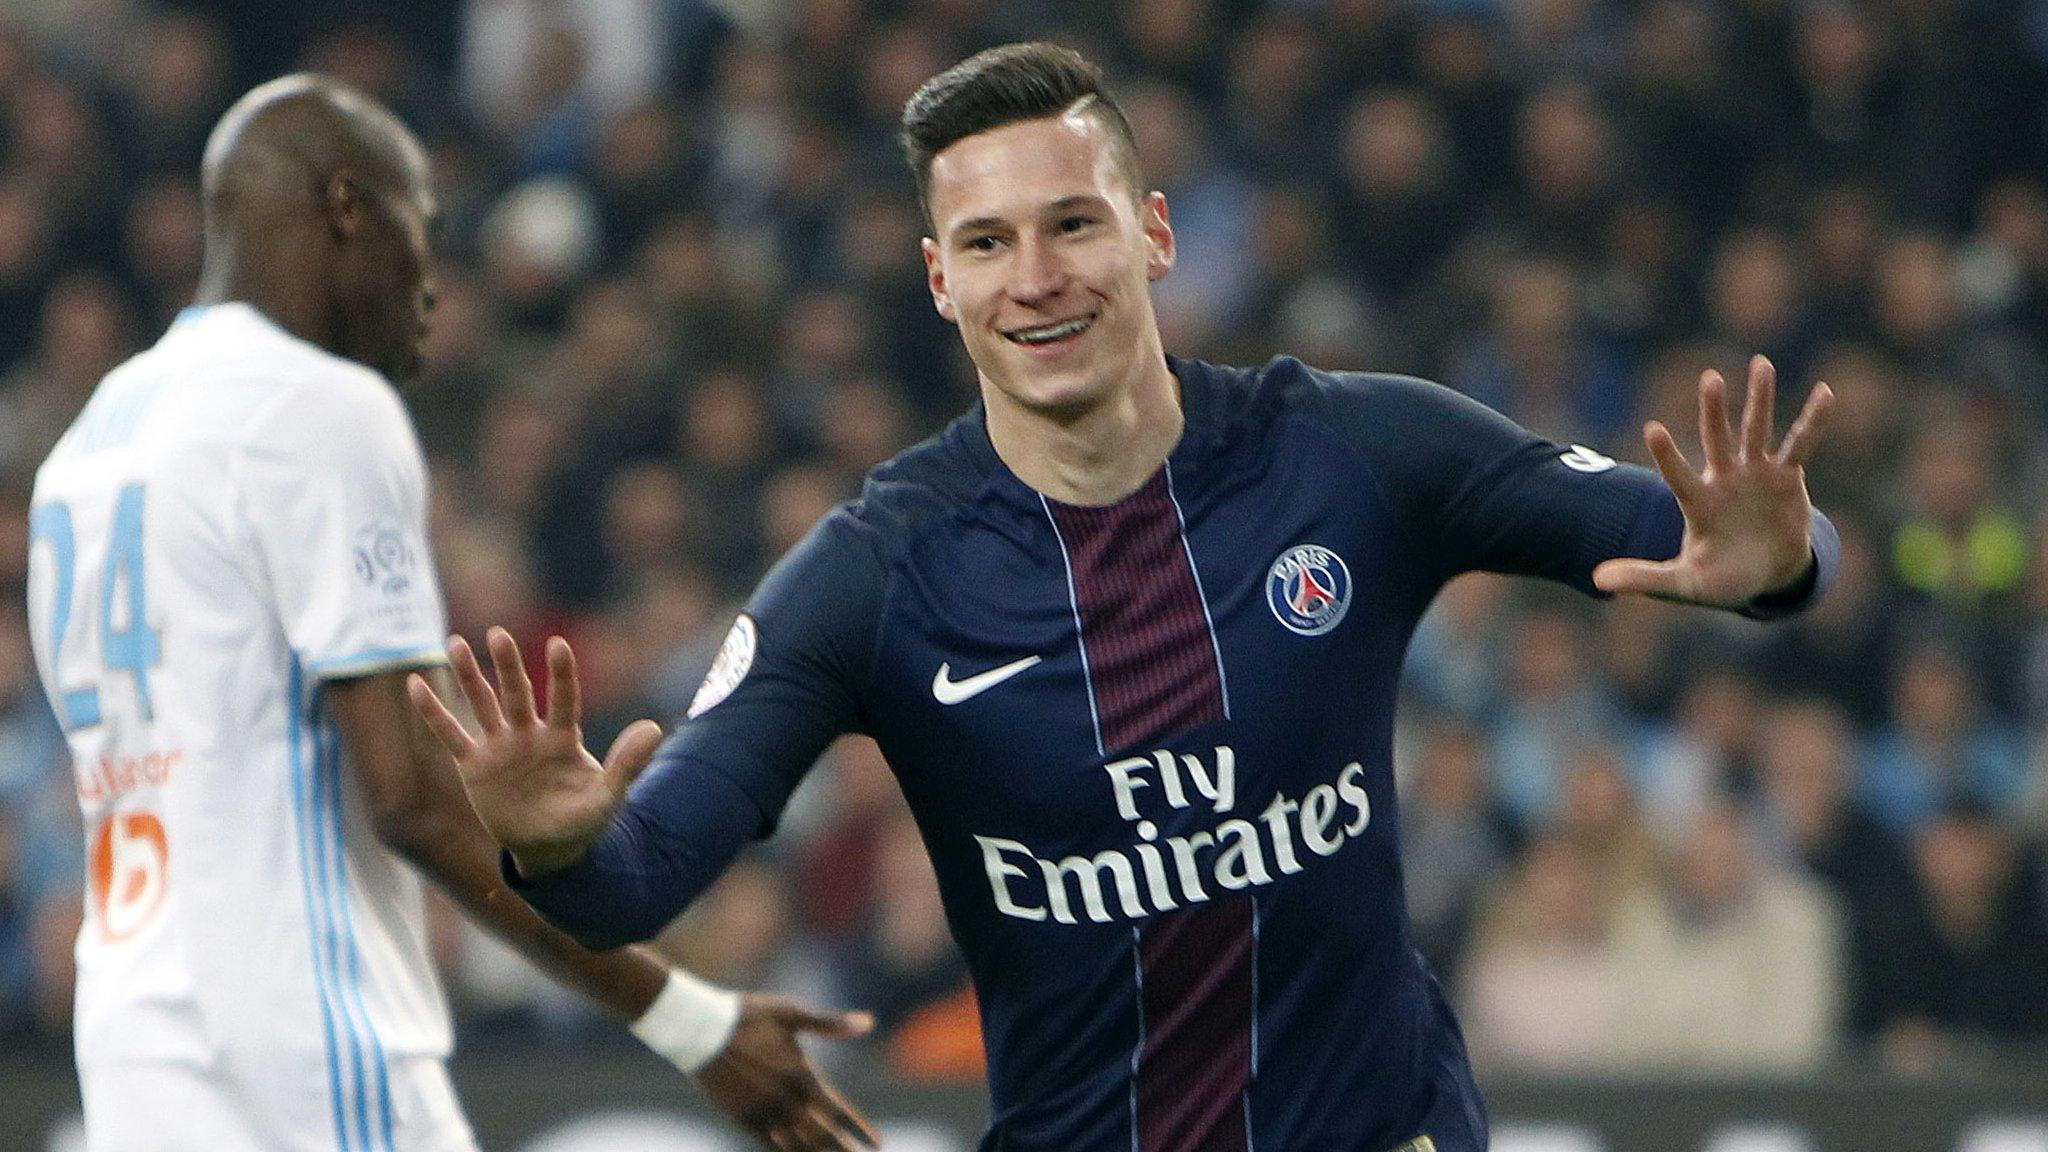 PSG thrash Marseille to move back into second